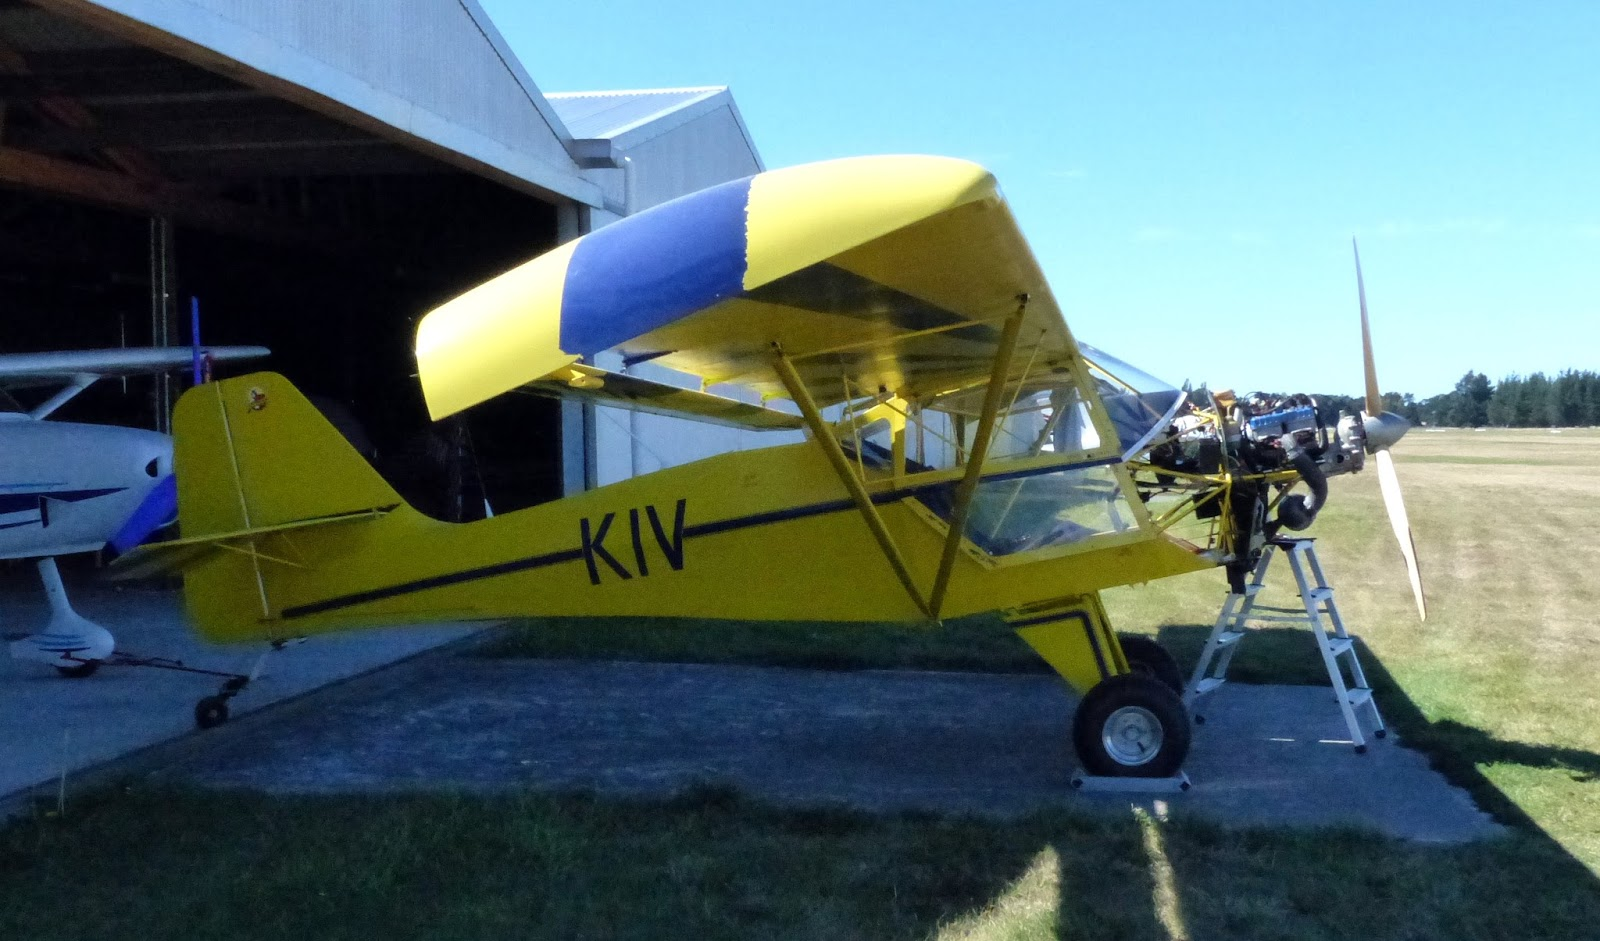 NZ Civil Aircraft: The Kitfox Godfrey Brothers